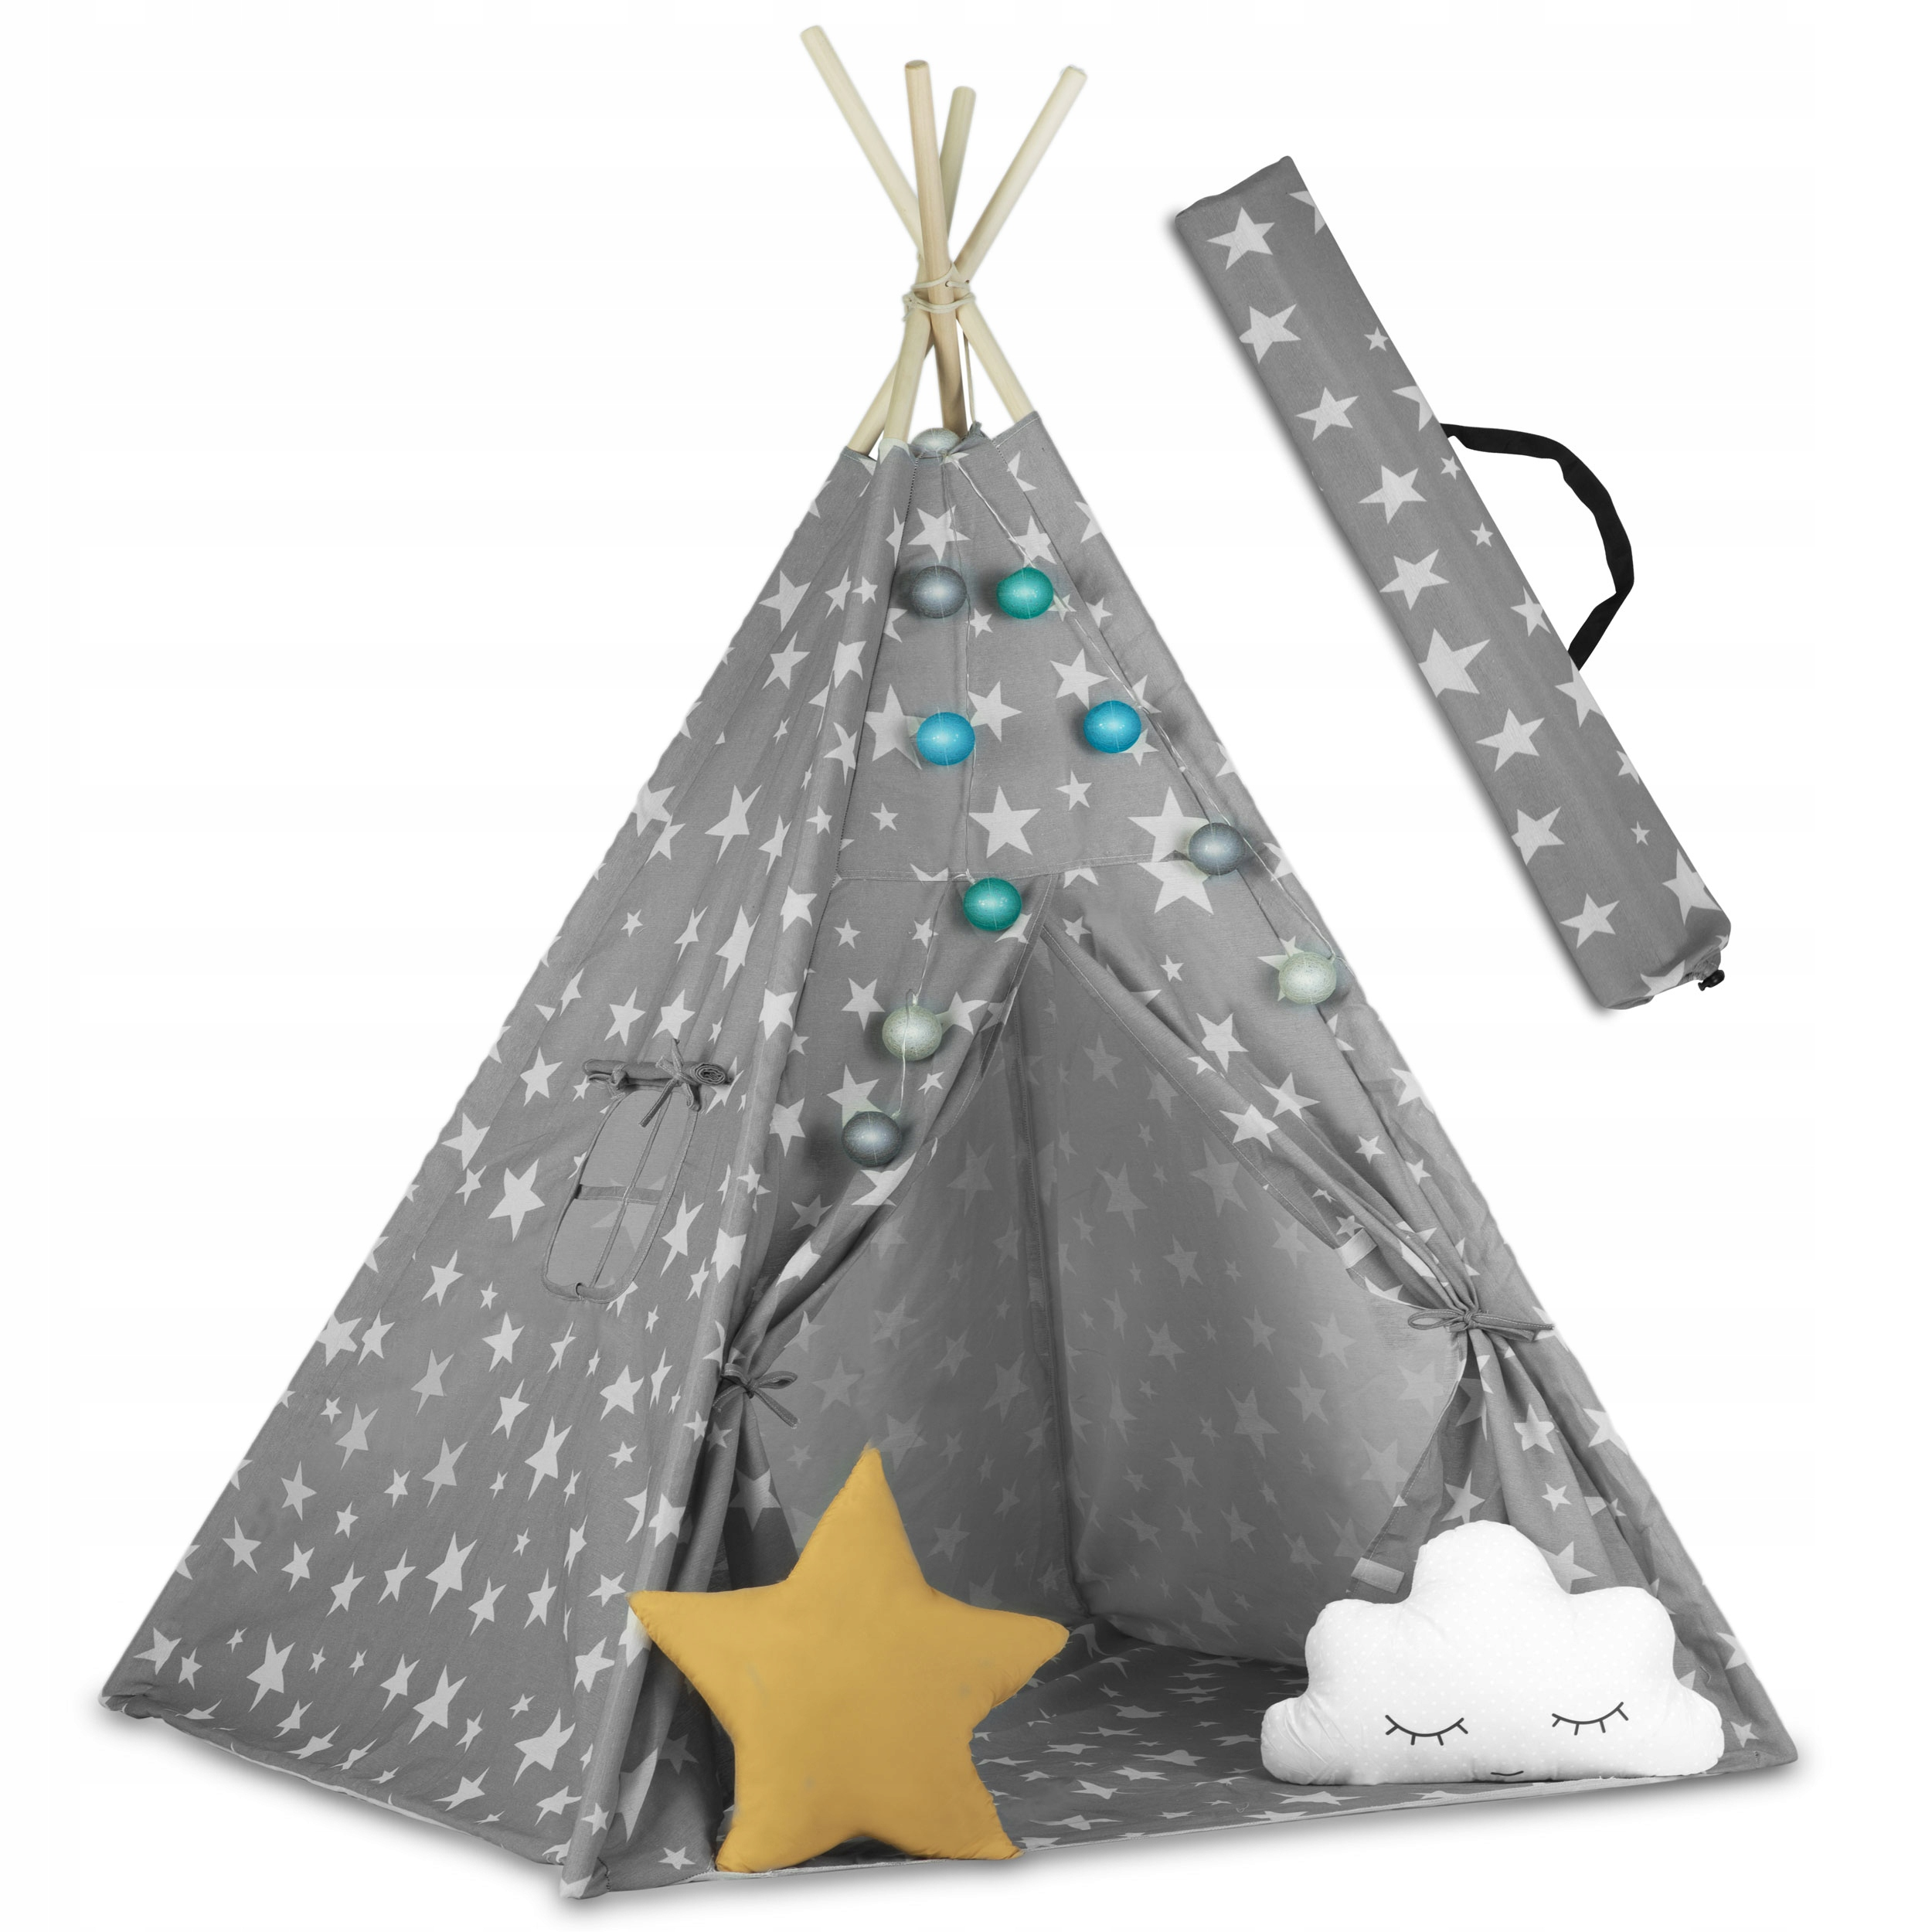 Палатка TIPI для детей TEEPEE Garland Pillows